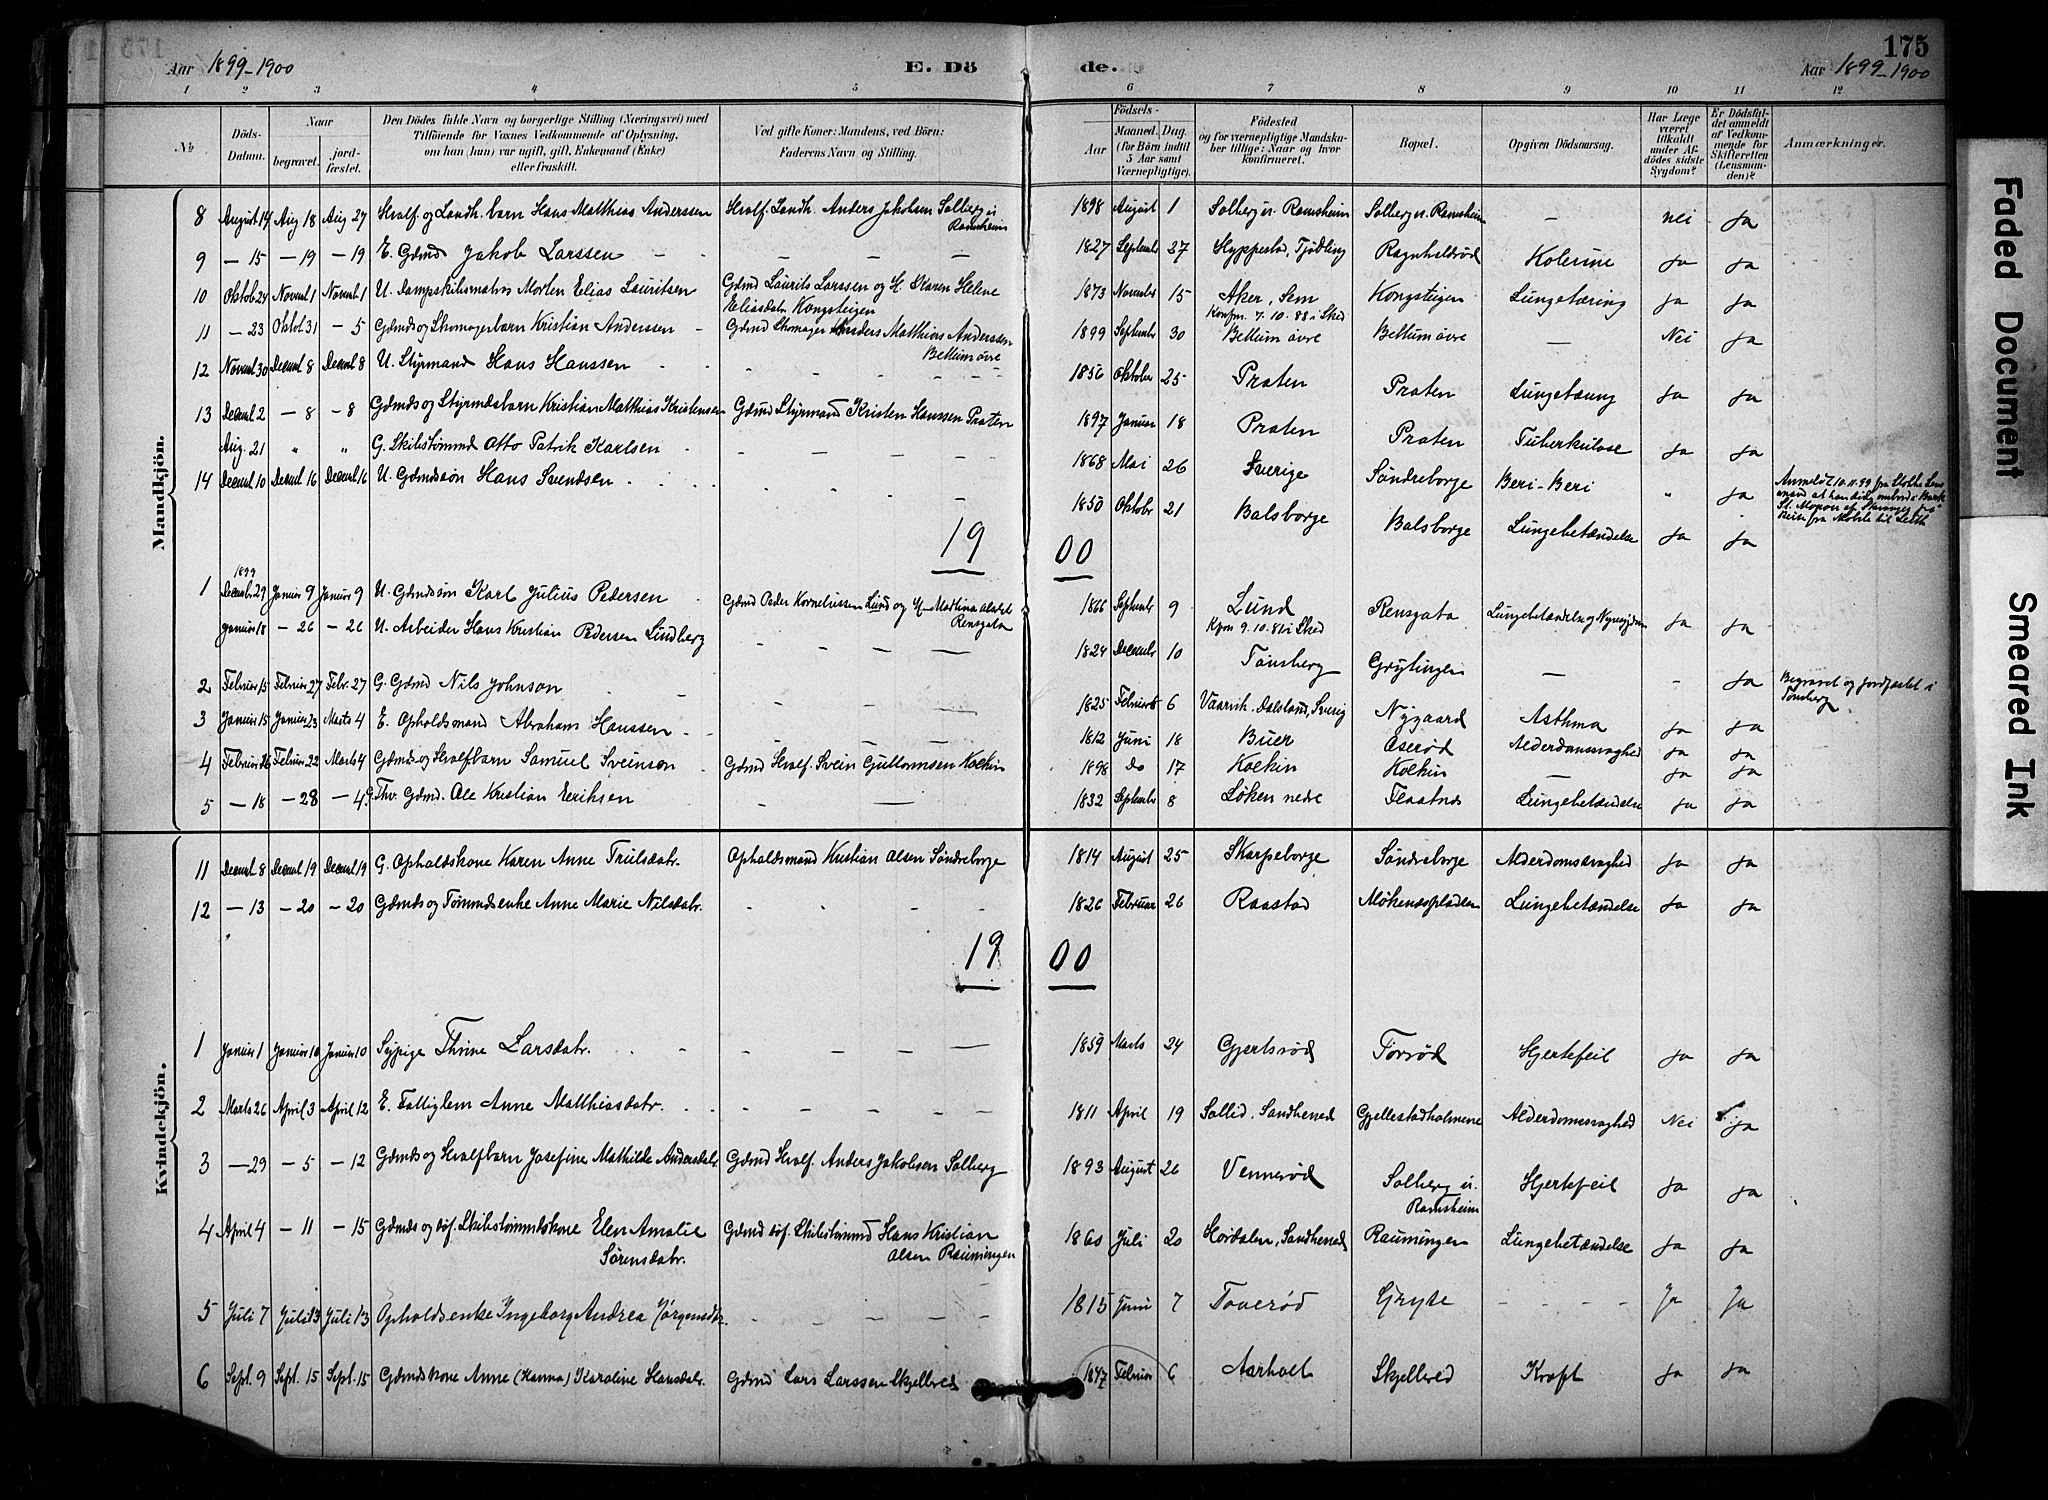 SAKO, Stokke kirkebøker, F/Fb/L0001: Ministerialbok nr. II 1, 1884-1910, s. 175